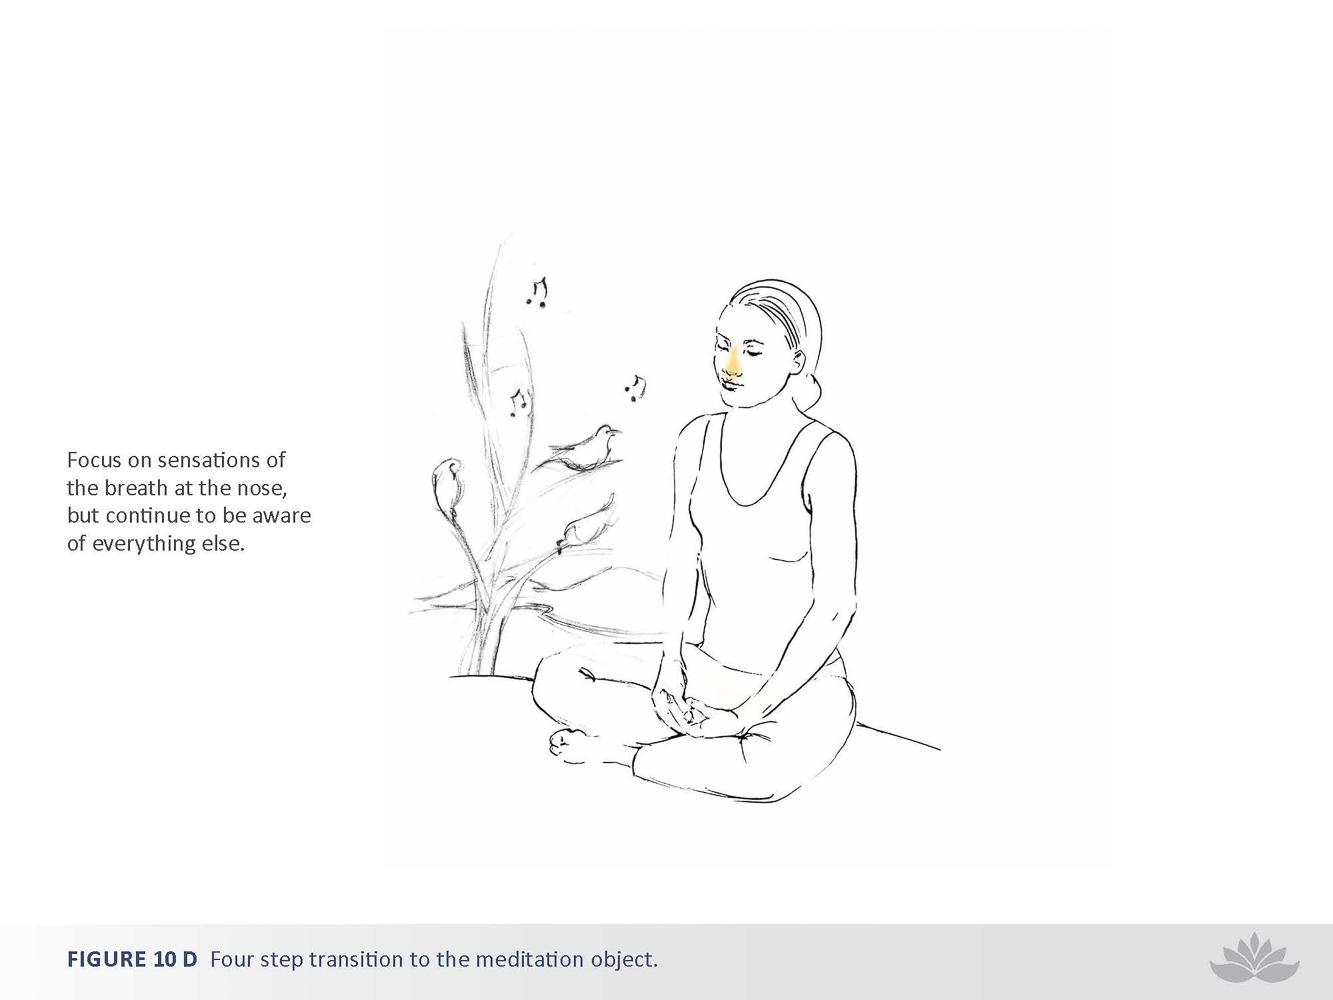 nwd-illustration-09-6.jpg